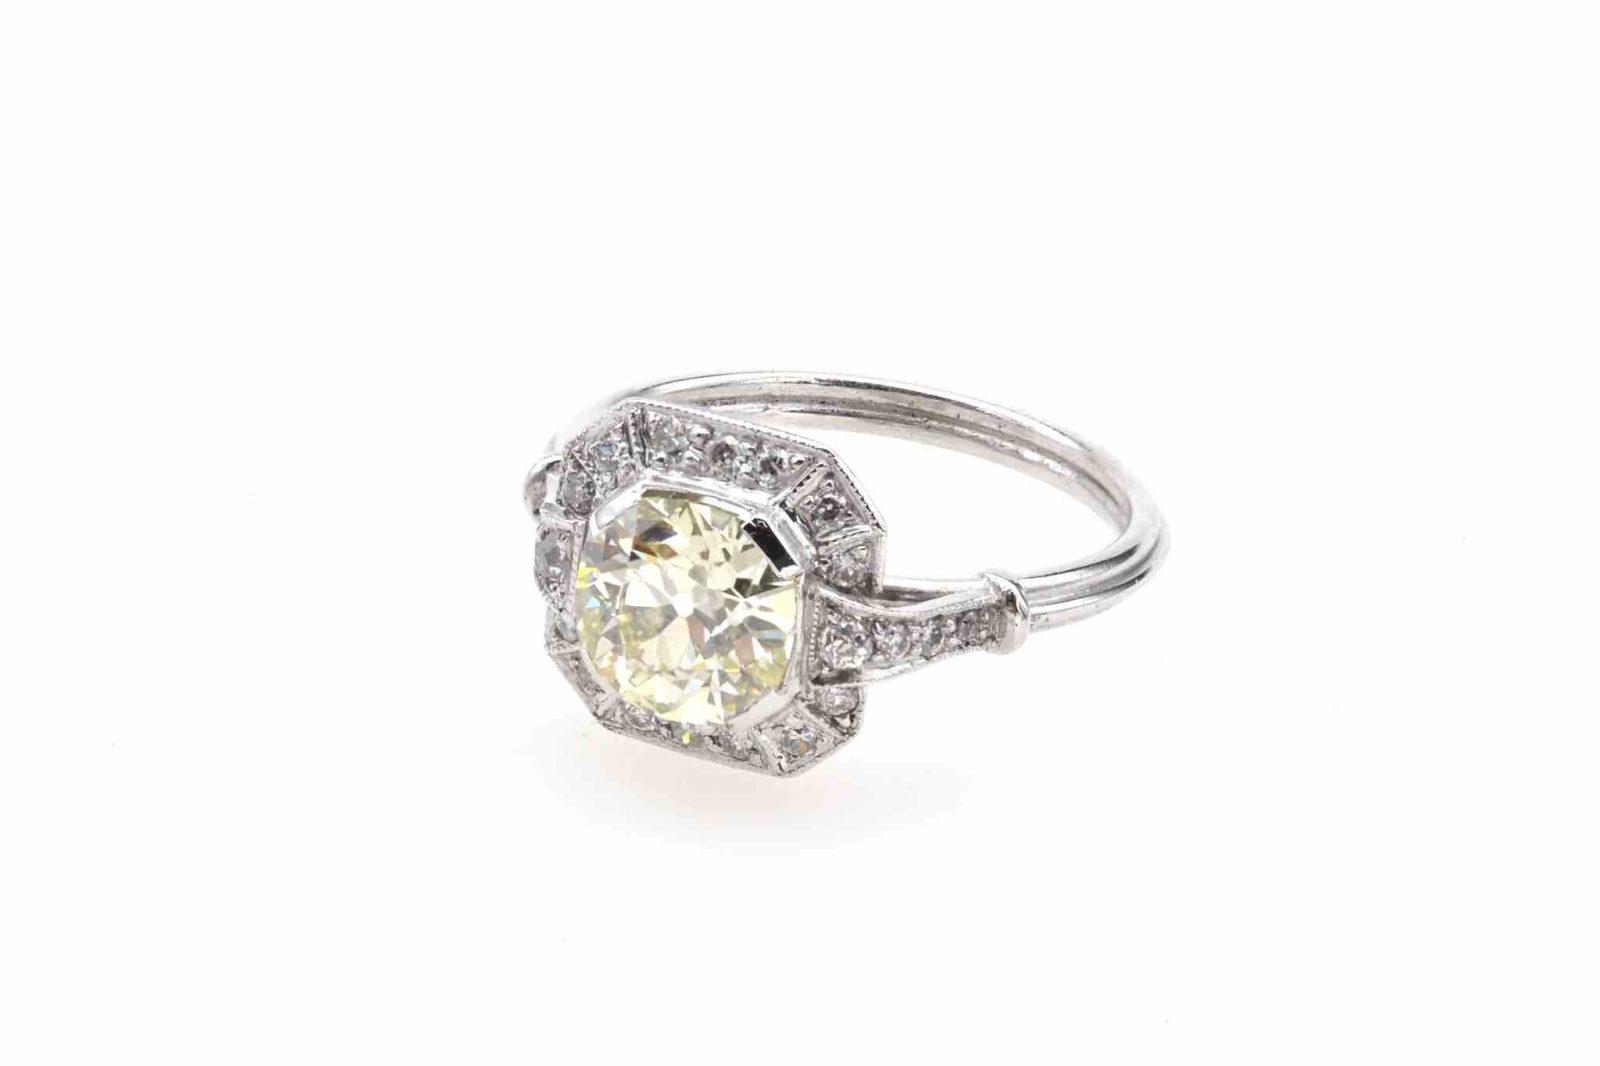 Bague diamant de 1,39 carats en platine